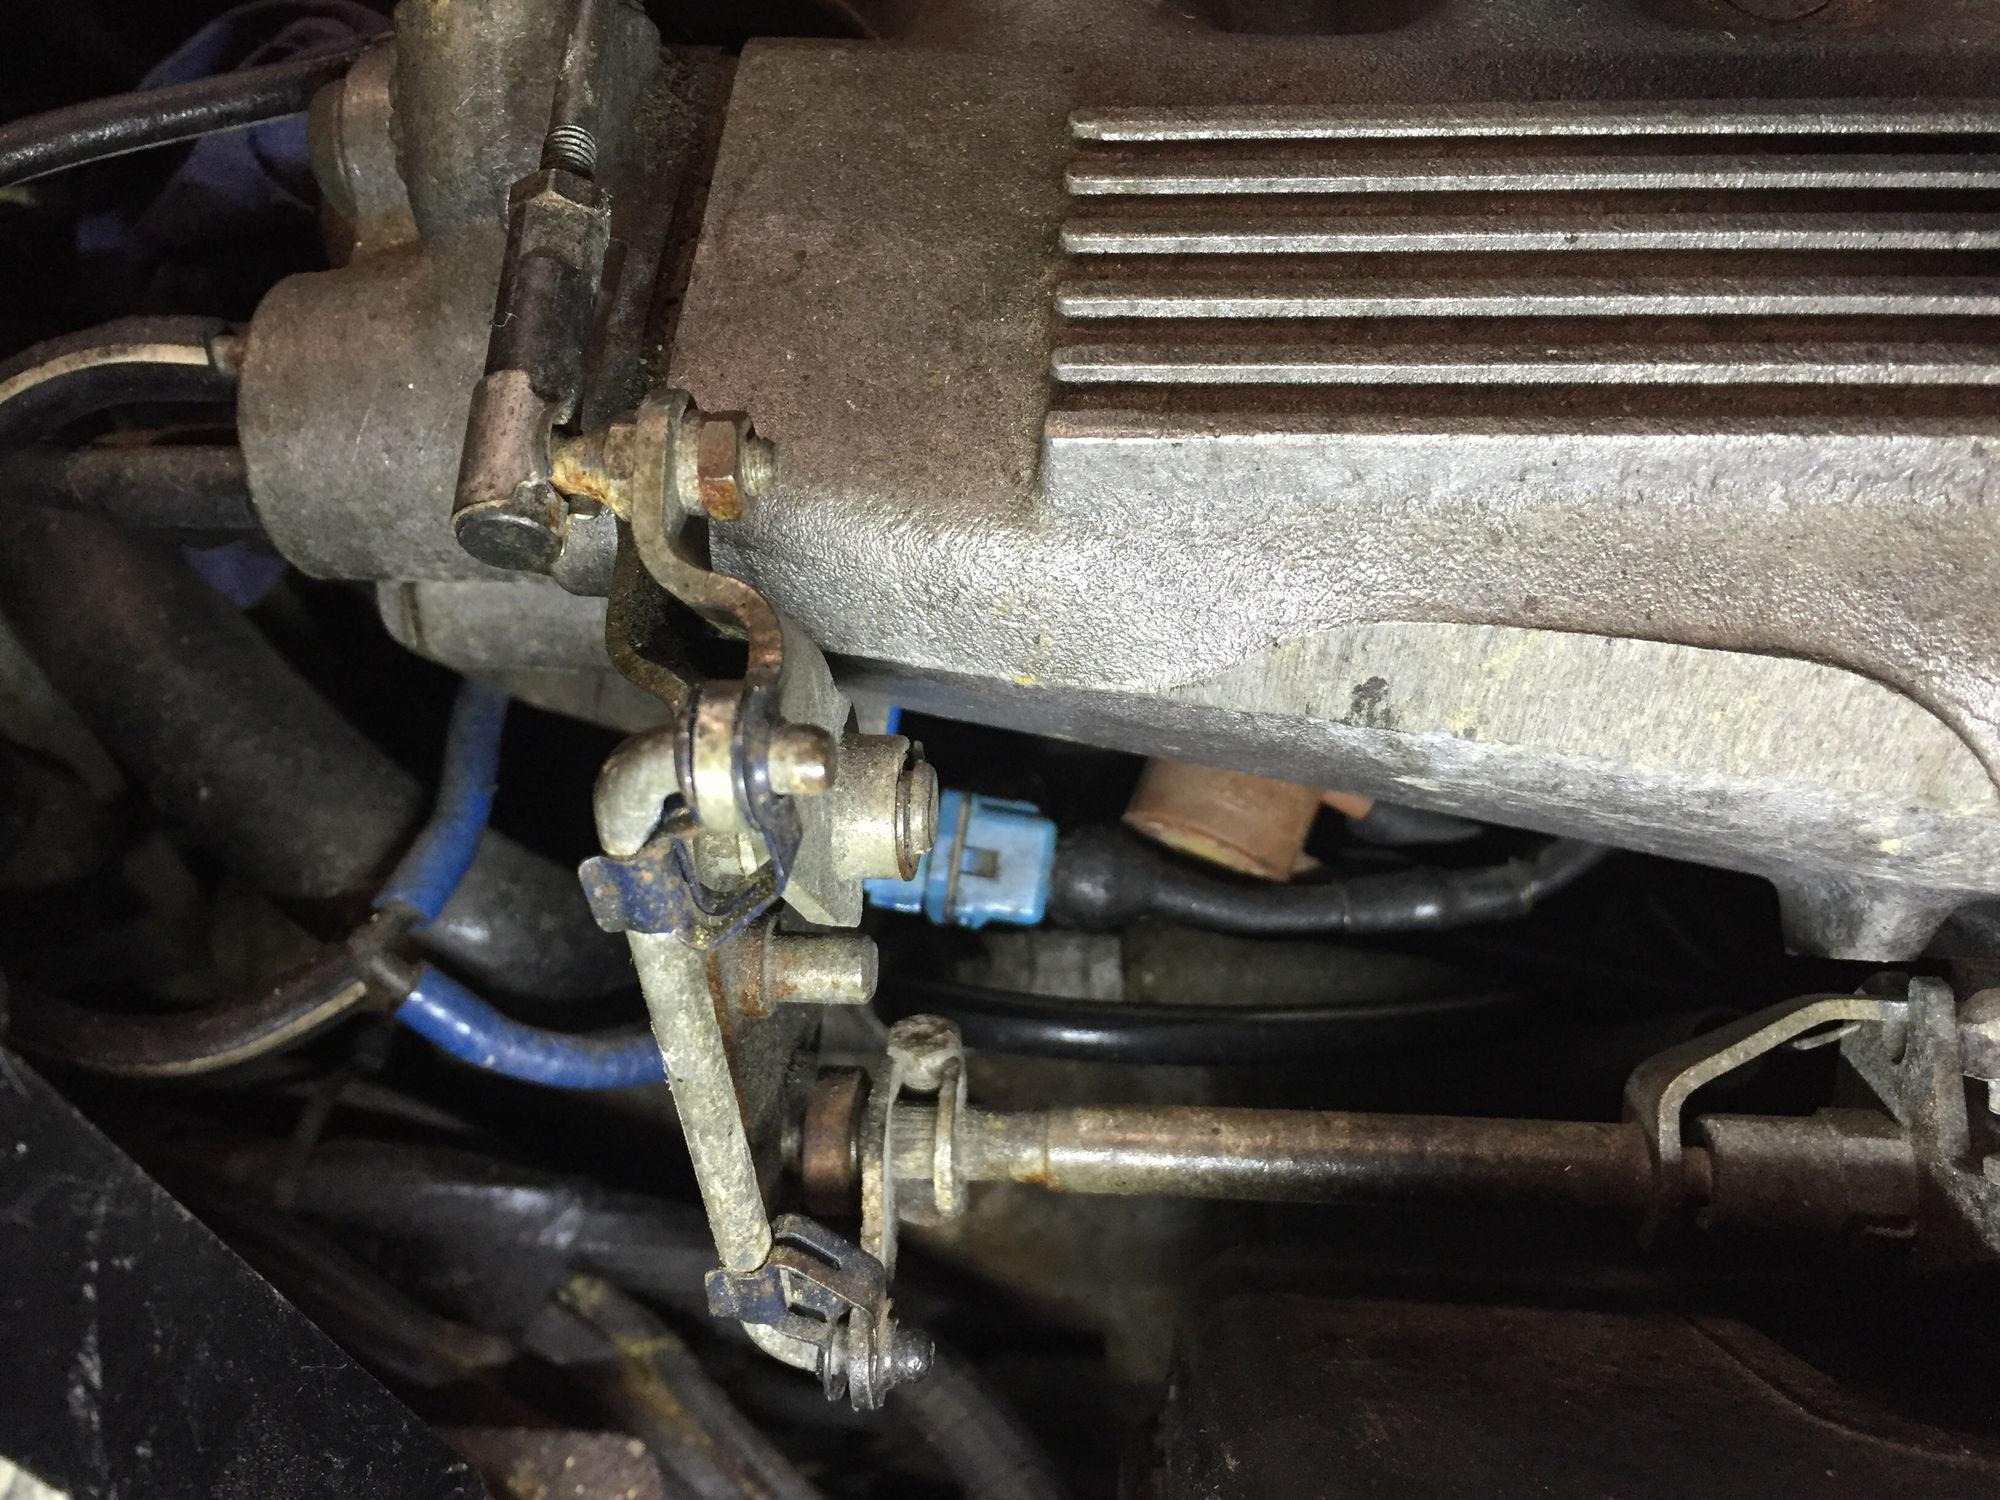 Jaguar Xjs Vacuum Diagram Reinvent Your Wiring X Type Engine Compartment Orphan Hose Forums Enthusiasts Forum Rh Jaguarforums Com S Heating